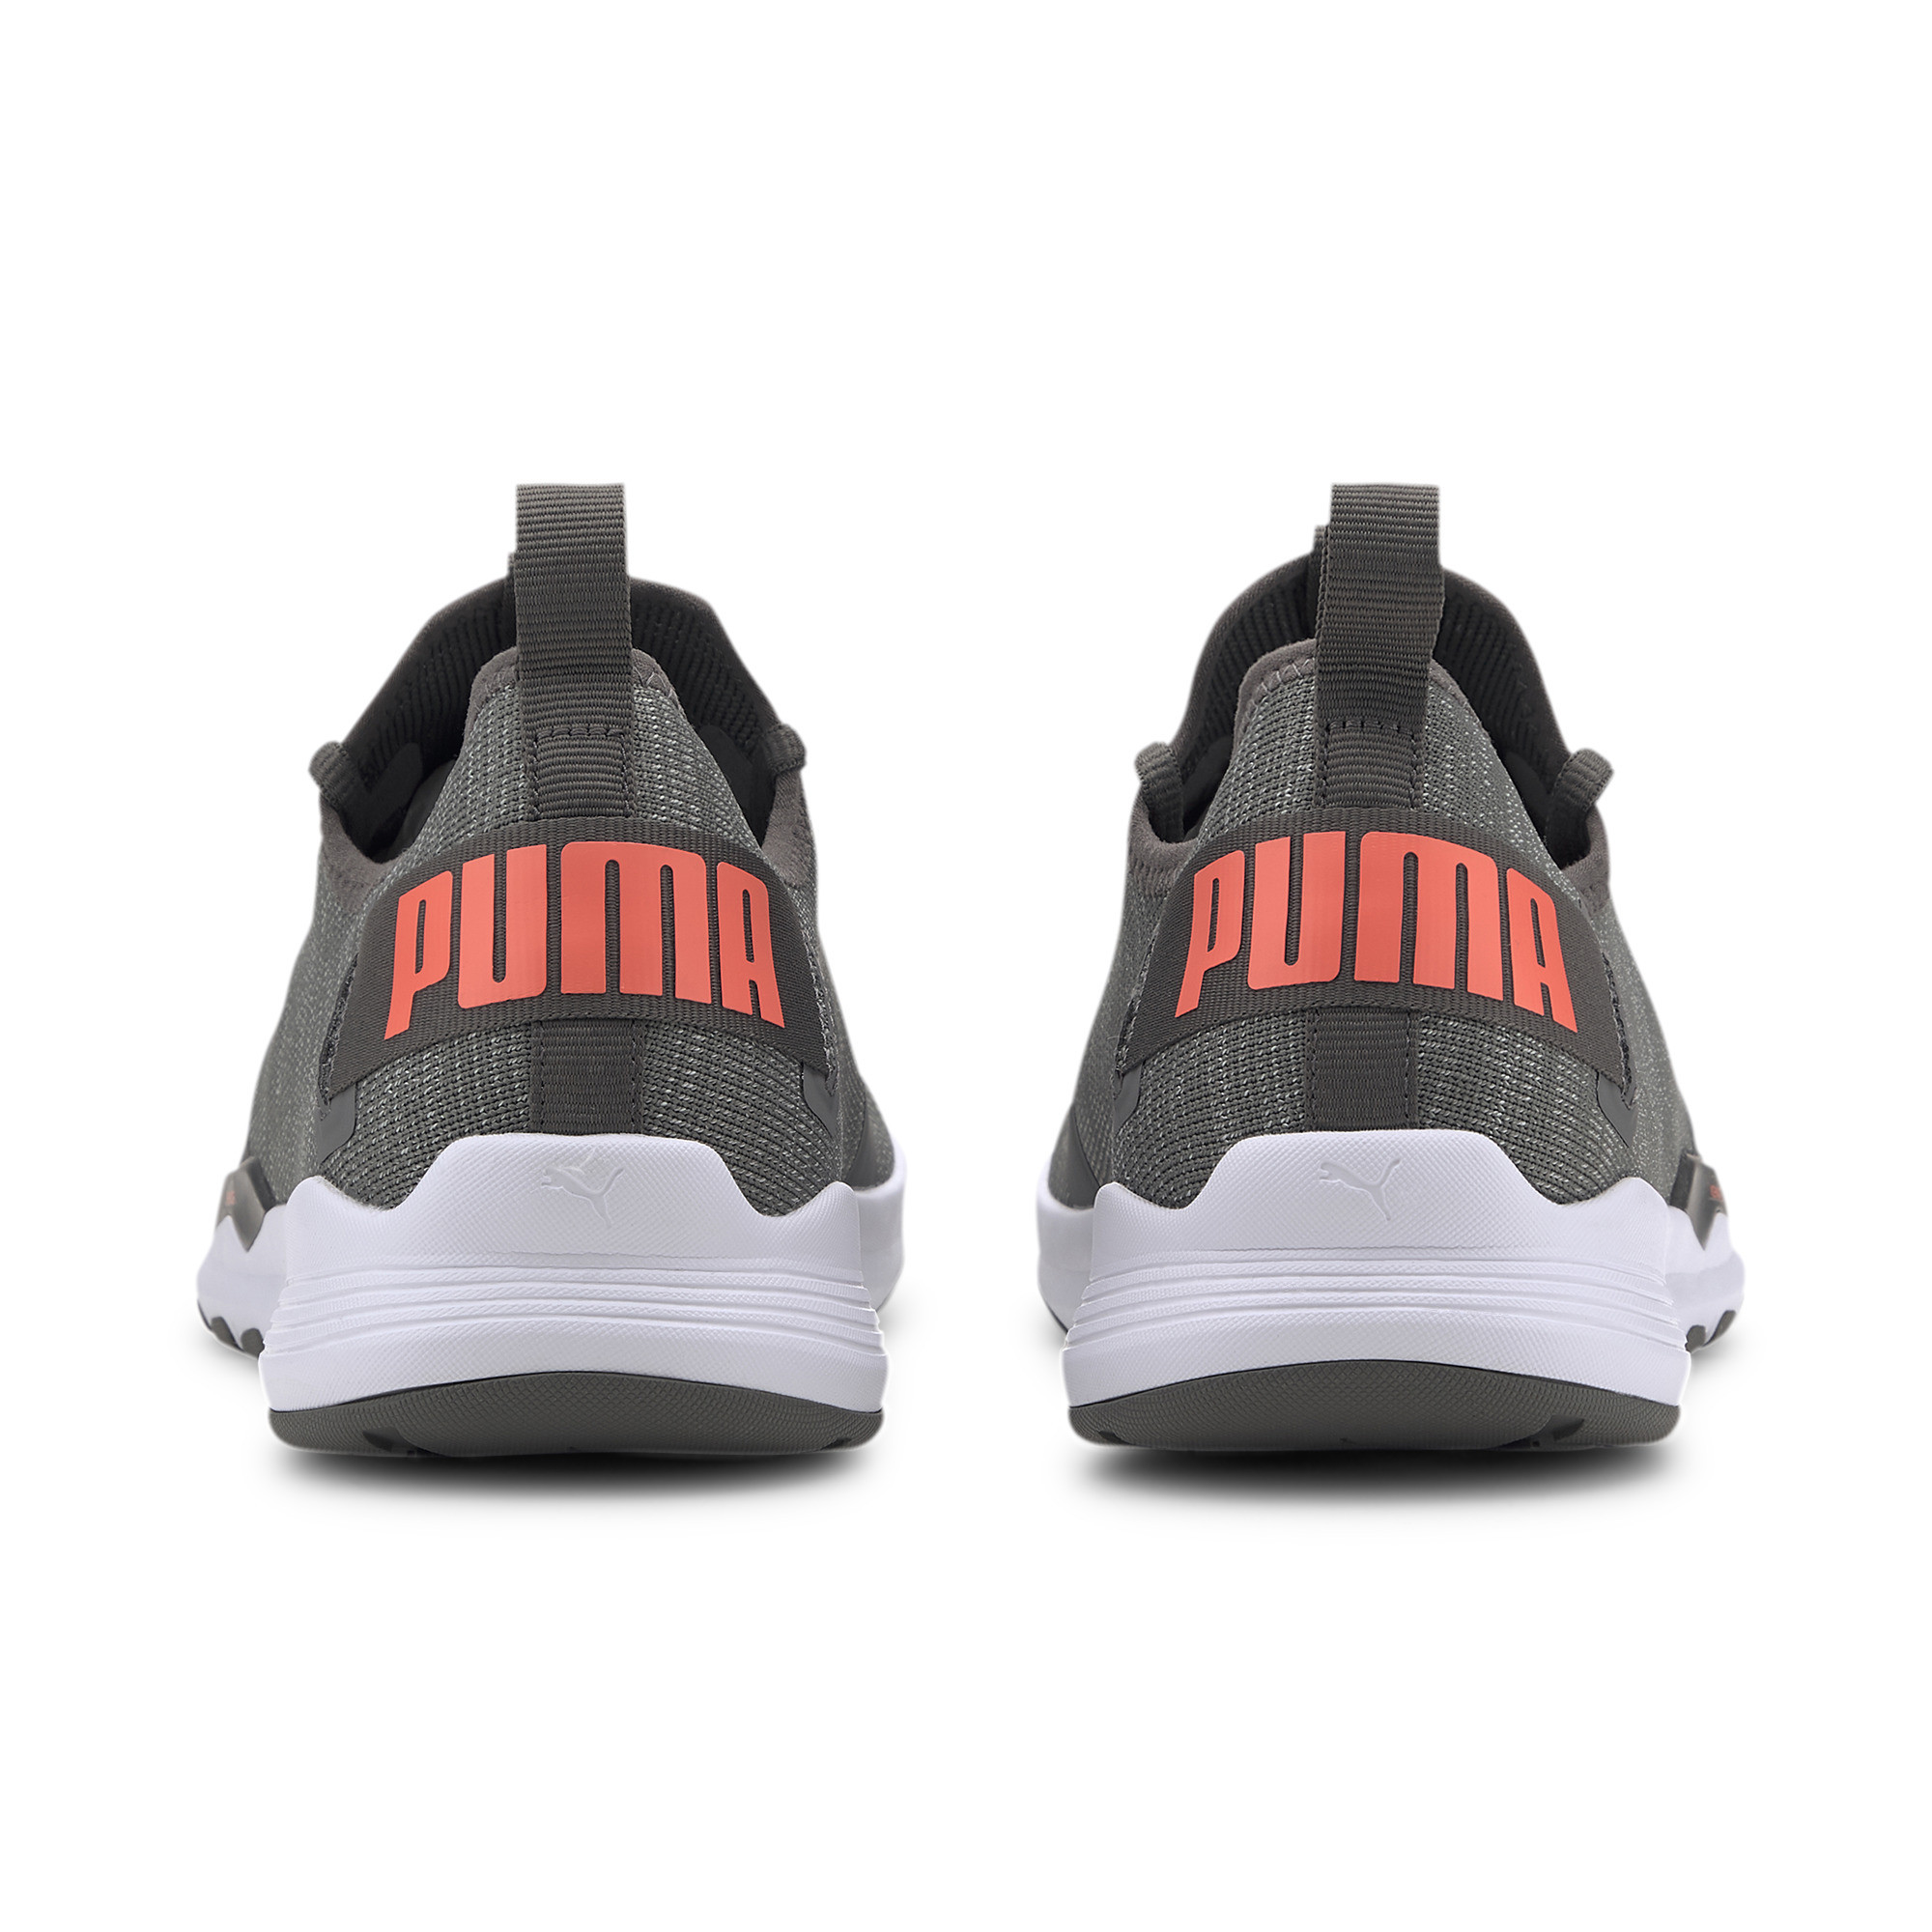 PUMA-Men-039-s-IGNITE-Contender-Knit-Running-Shoes thumbnail 3